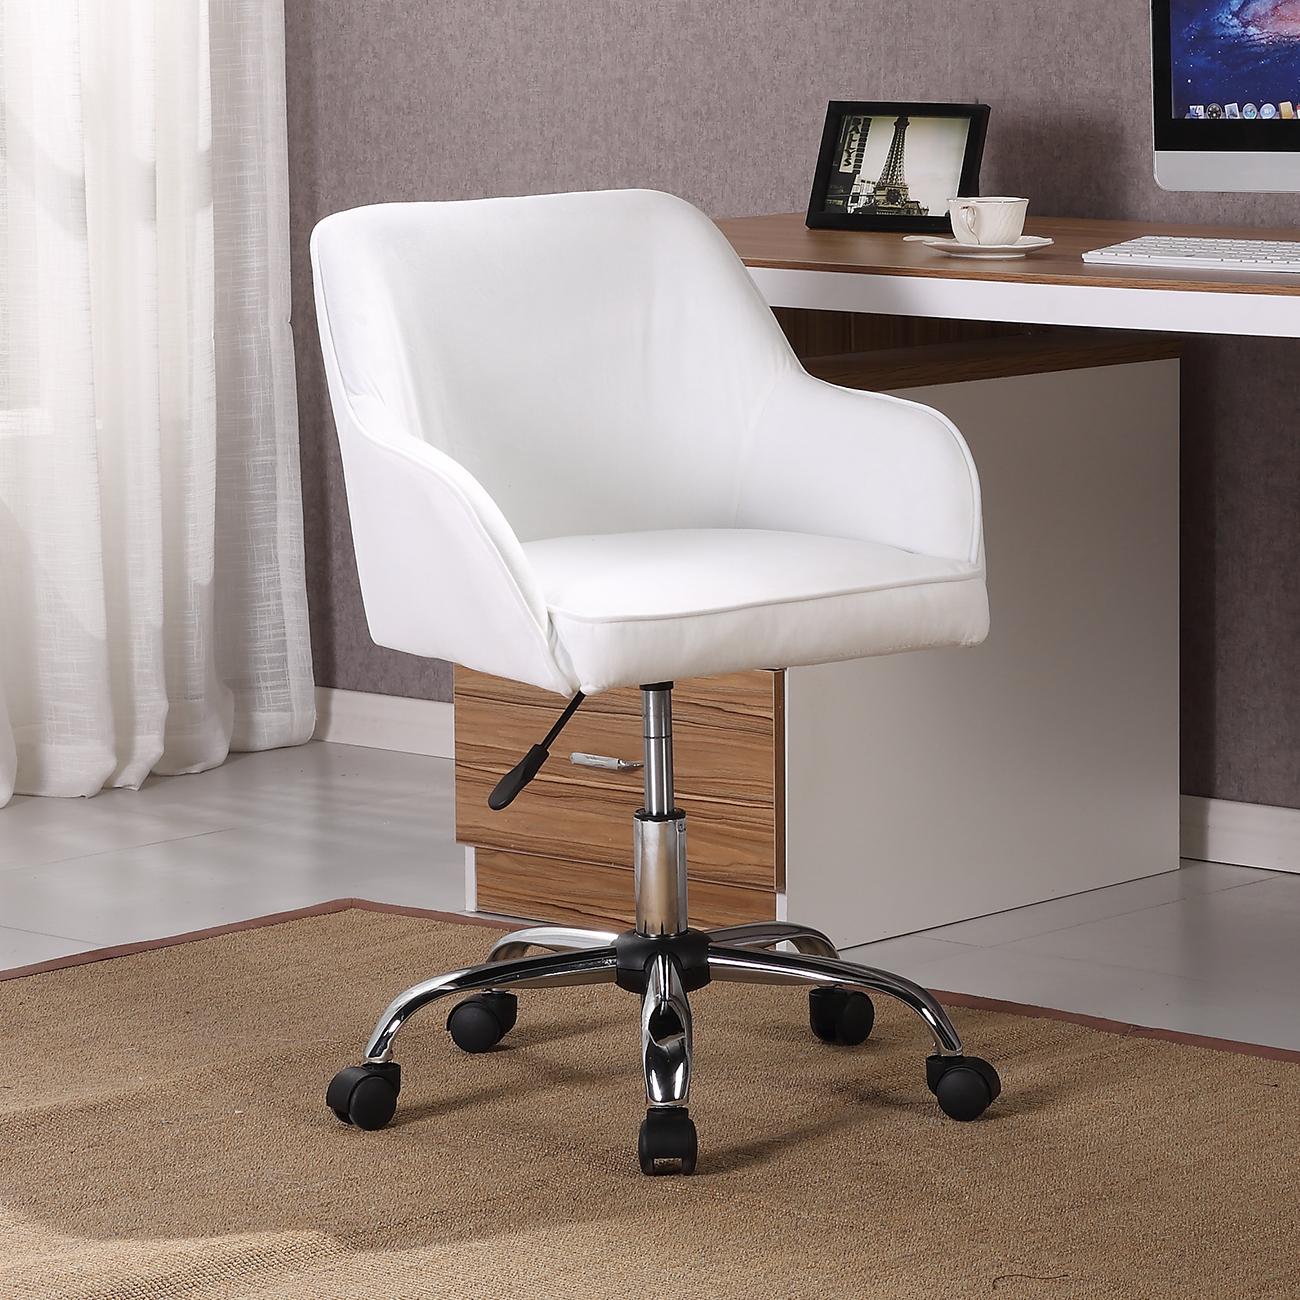 Modern Office Chair Task Desk Adjustable Swivel Height W ...